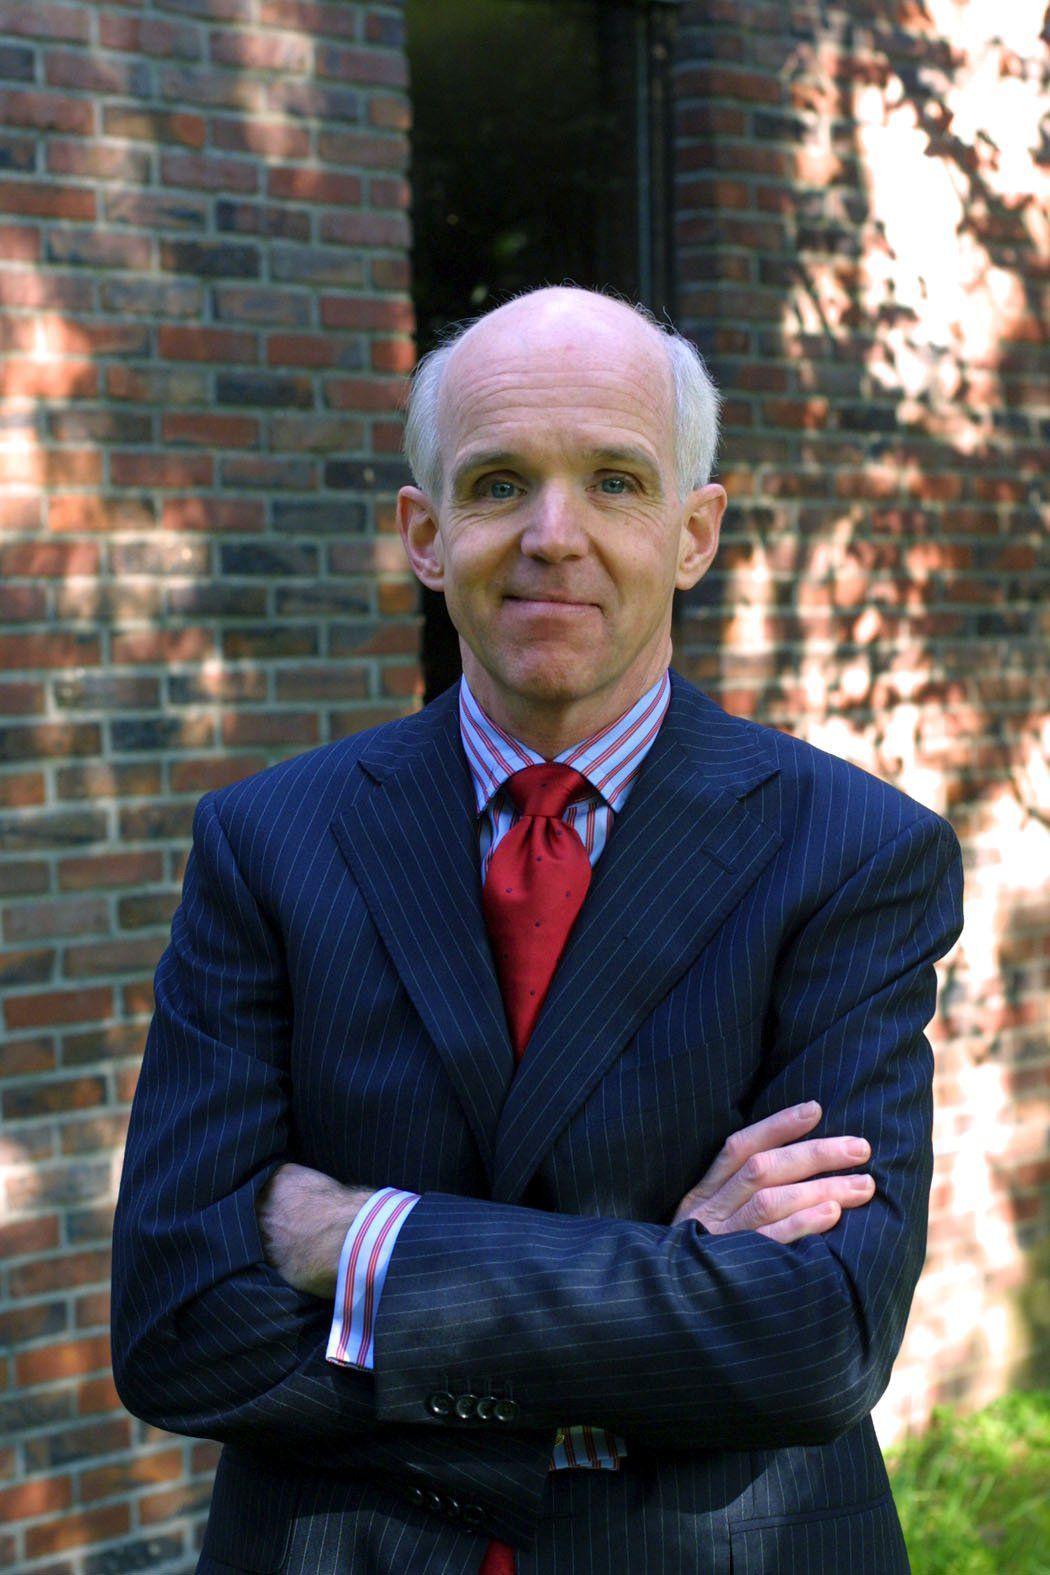 Geert Dales vindt vrijheid van meningsuiting ondergeschikt aan het verbod op discriminatie. (Foto NRC Handelsblad, Maurice Boyer) Geert Dales, wethouder Financien Amsterdam Foto NRC H'Blad, Maurice Boyer 021010